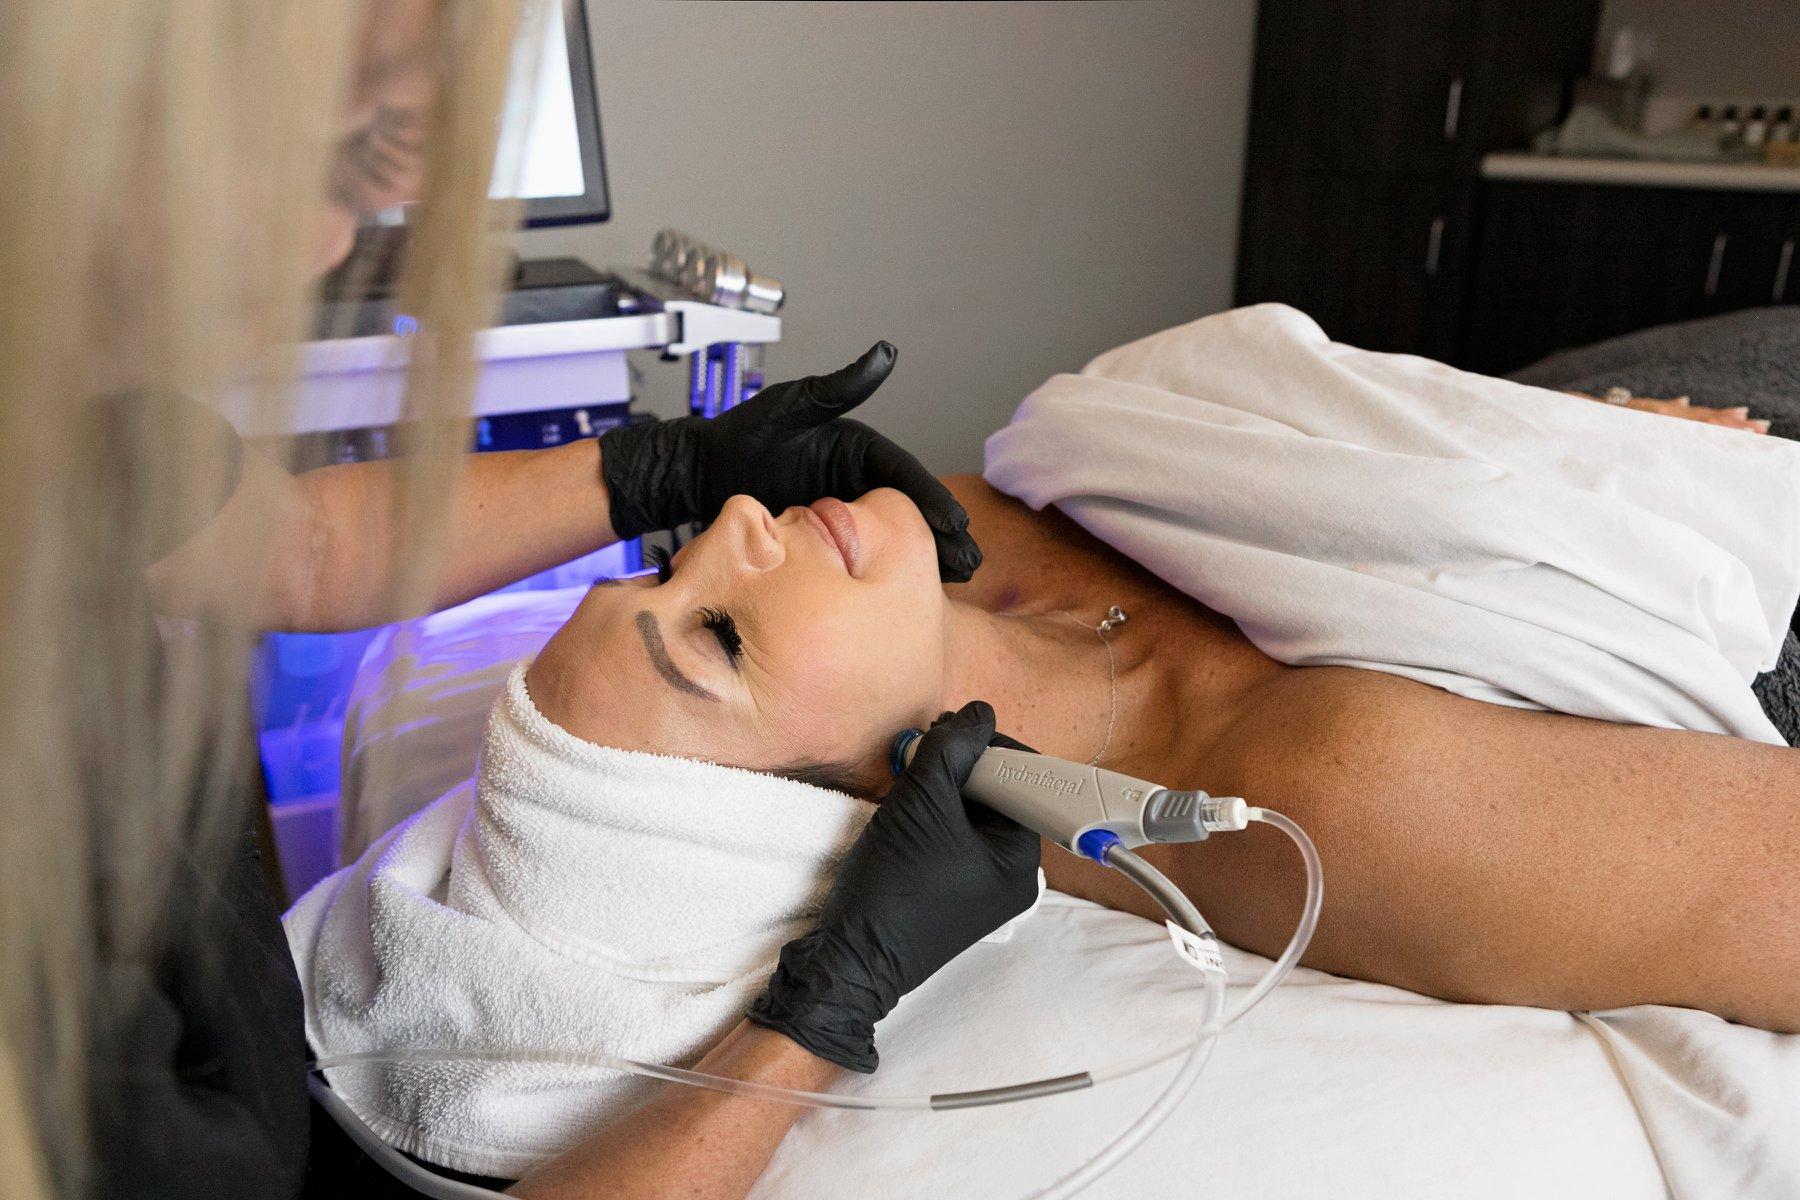 acacia spa springfield missouri woman facial hydrofacial